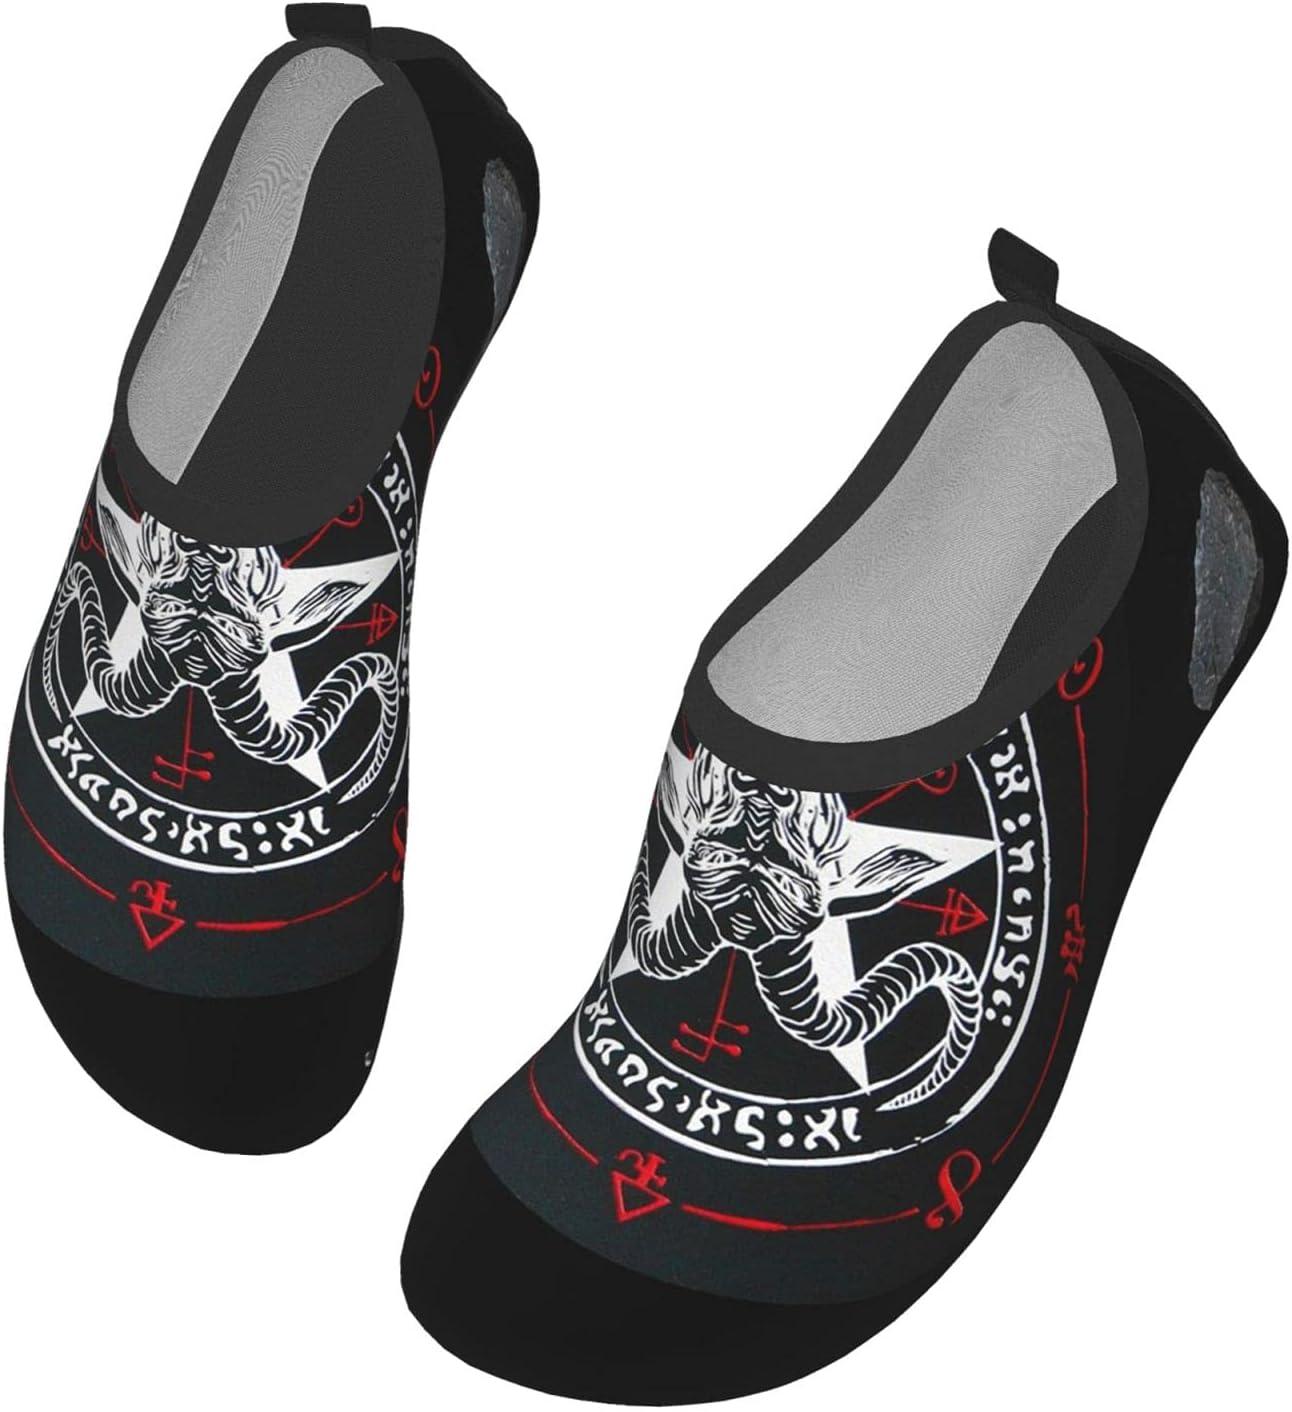 Womens Mens Summer Water Shoes Demon Baphomet Satanic Goat Head Barefoot Shoe Quick Dry Aqua Socks